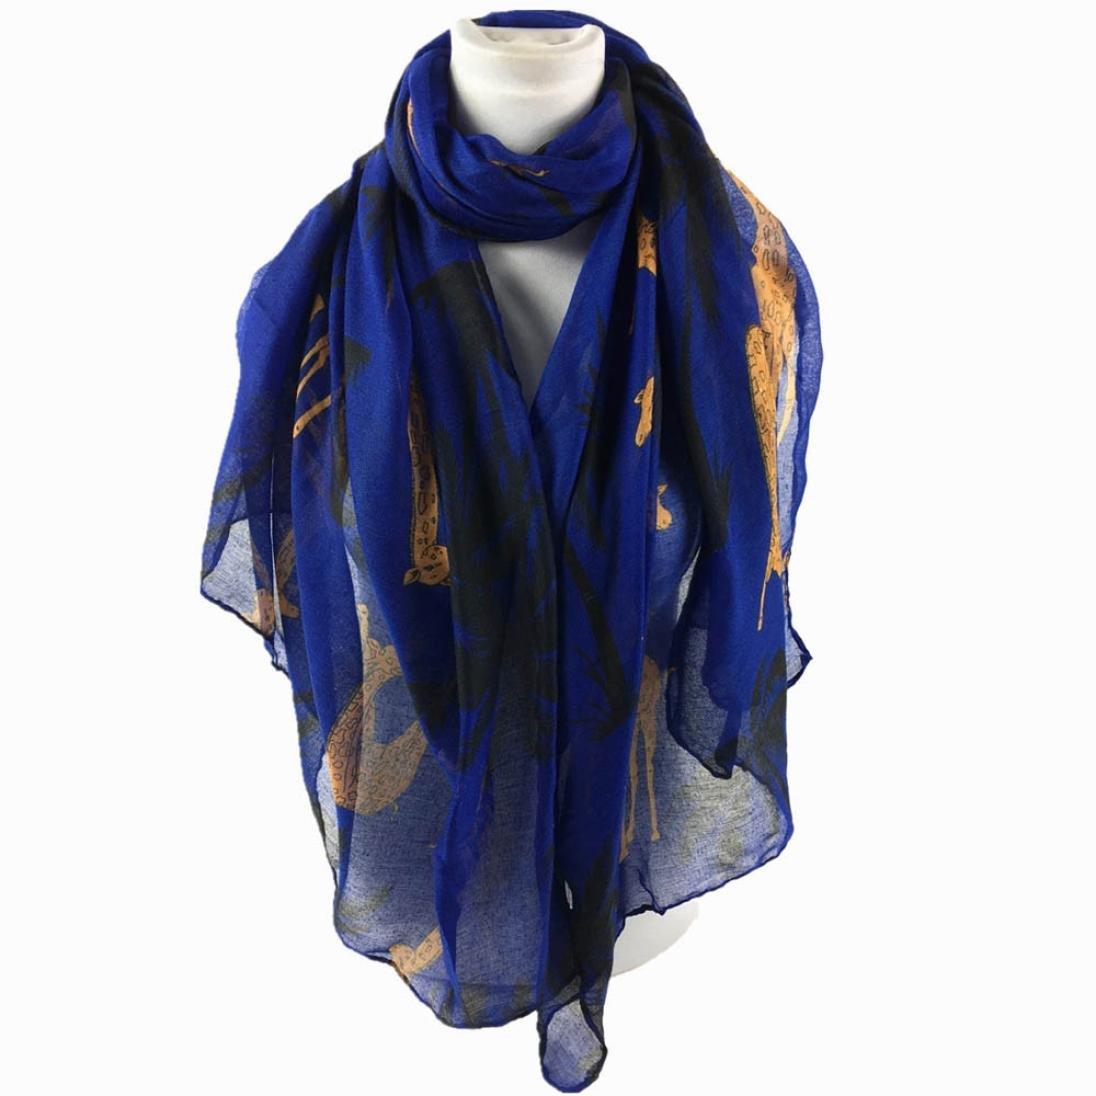 HUHU833 Écharpes châle foulards Femmes mode impression girafe longue  écharpe châle Automne Hiver 8880f0102e3